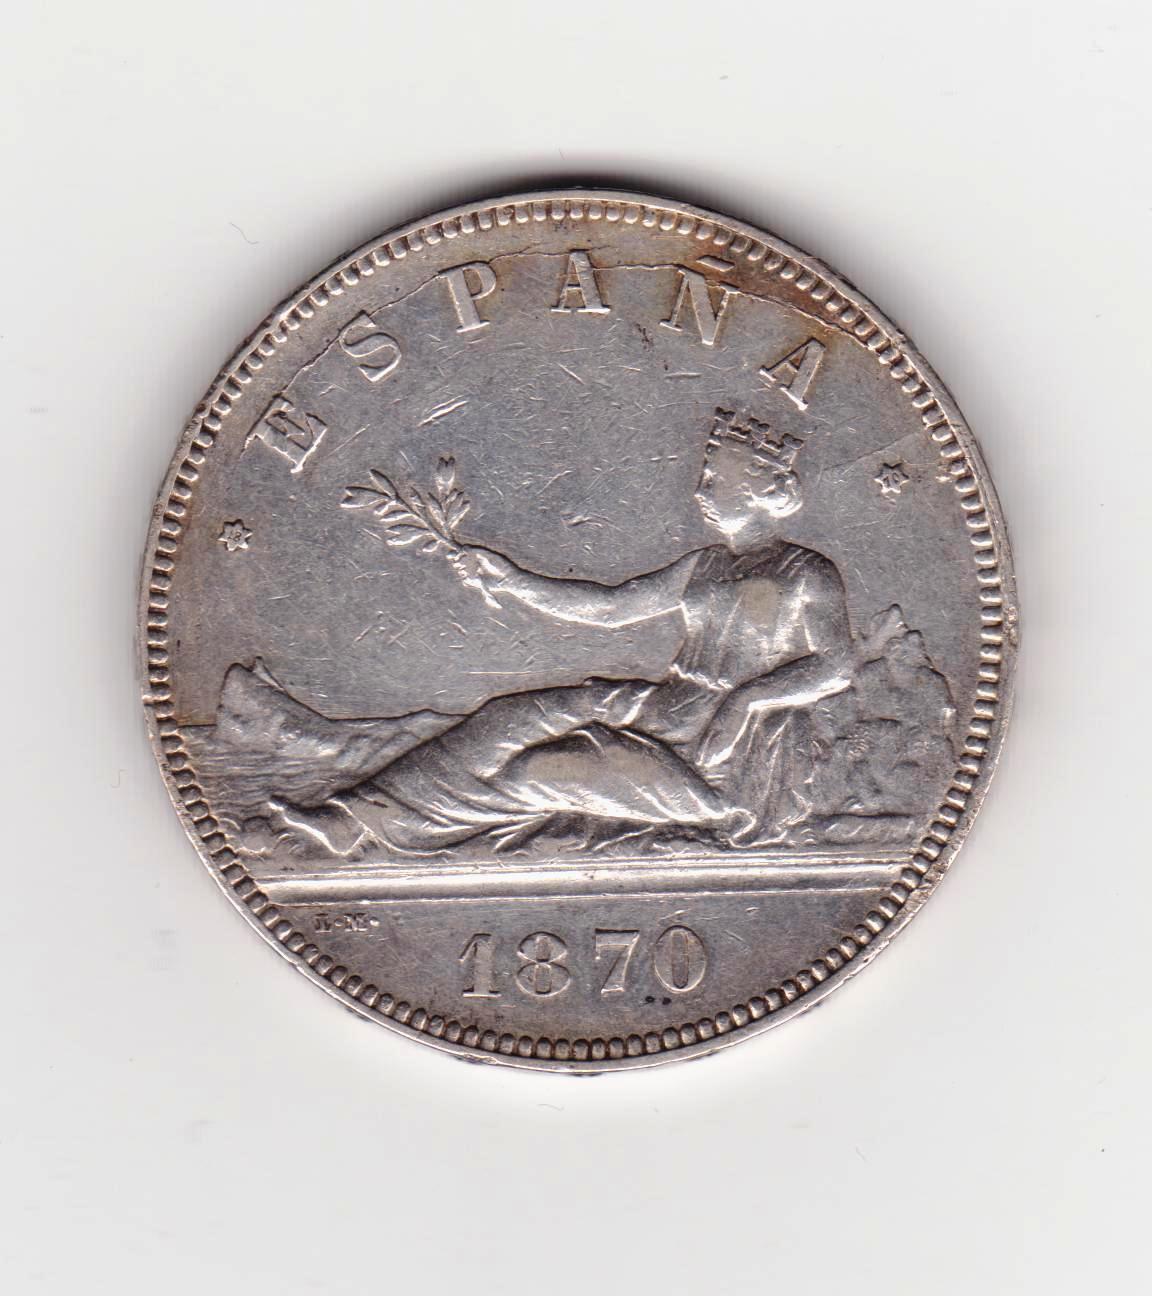 5 pesetas 1870 5_pesetas_1870